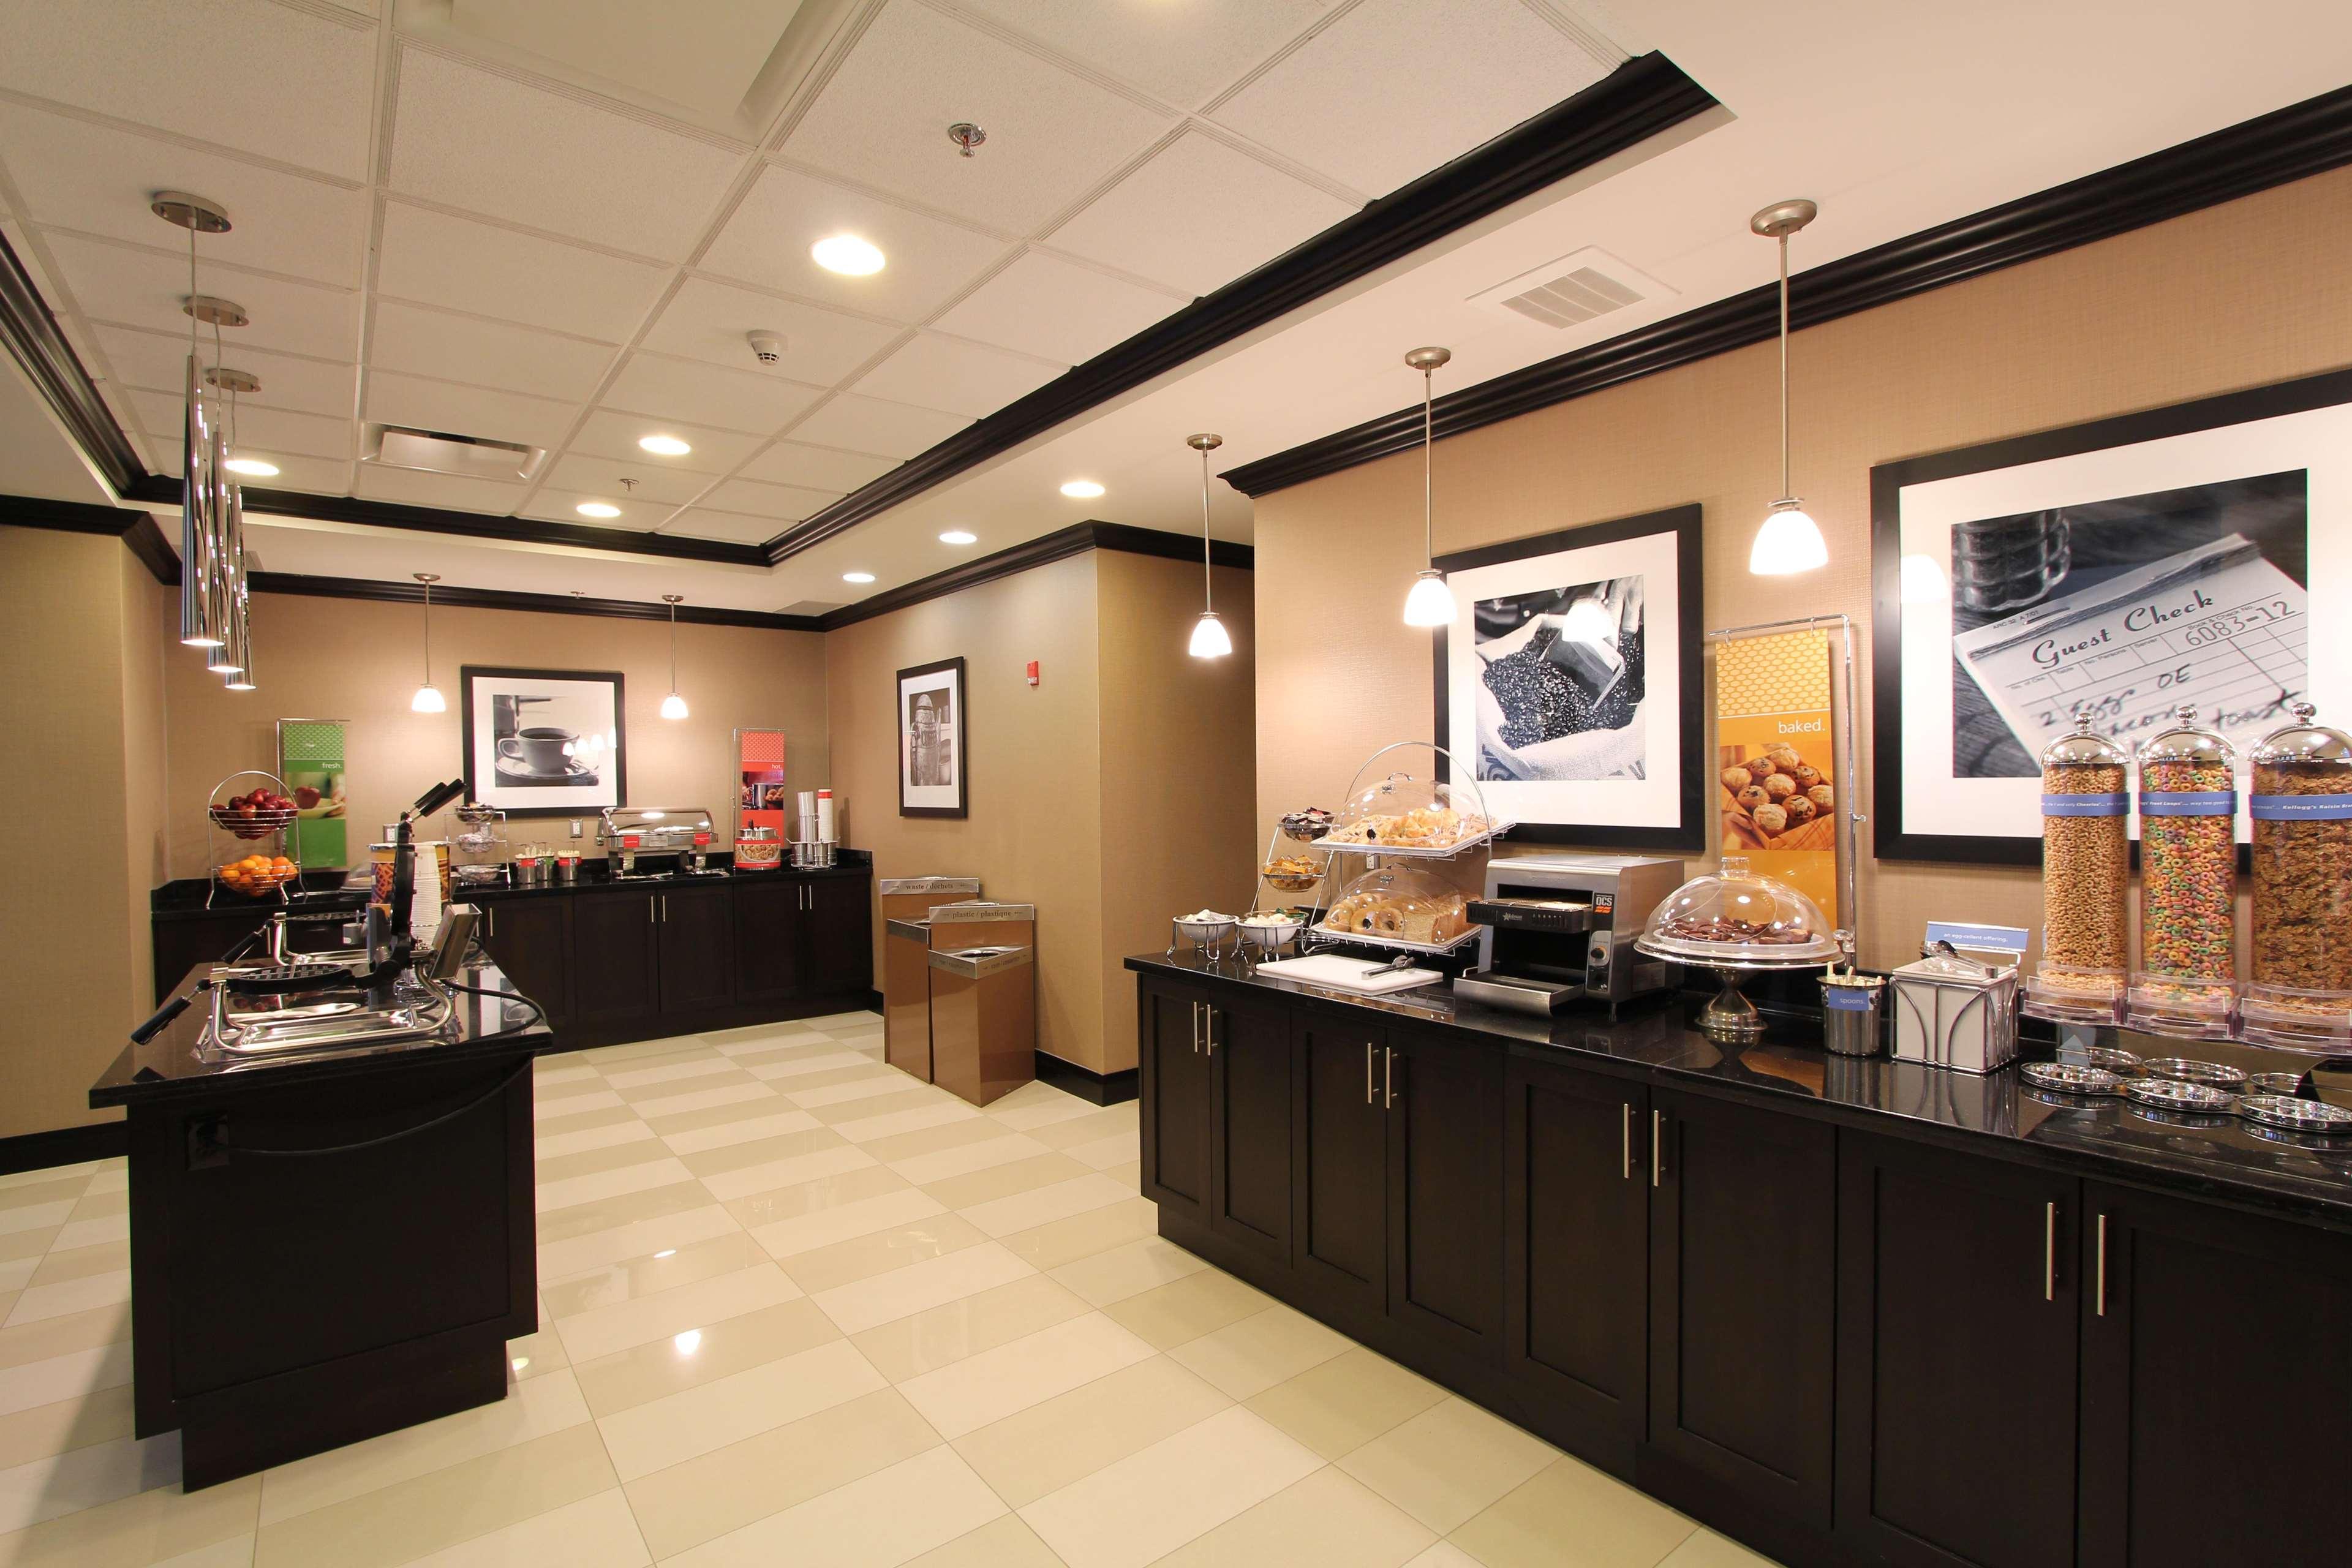 Hampton Inn & Suites by Hilton St. John's Airport